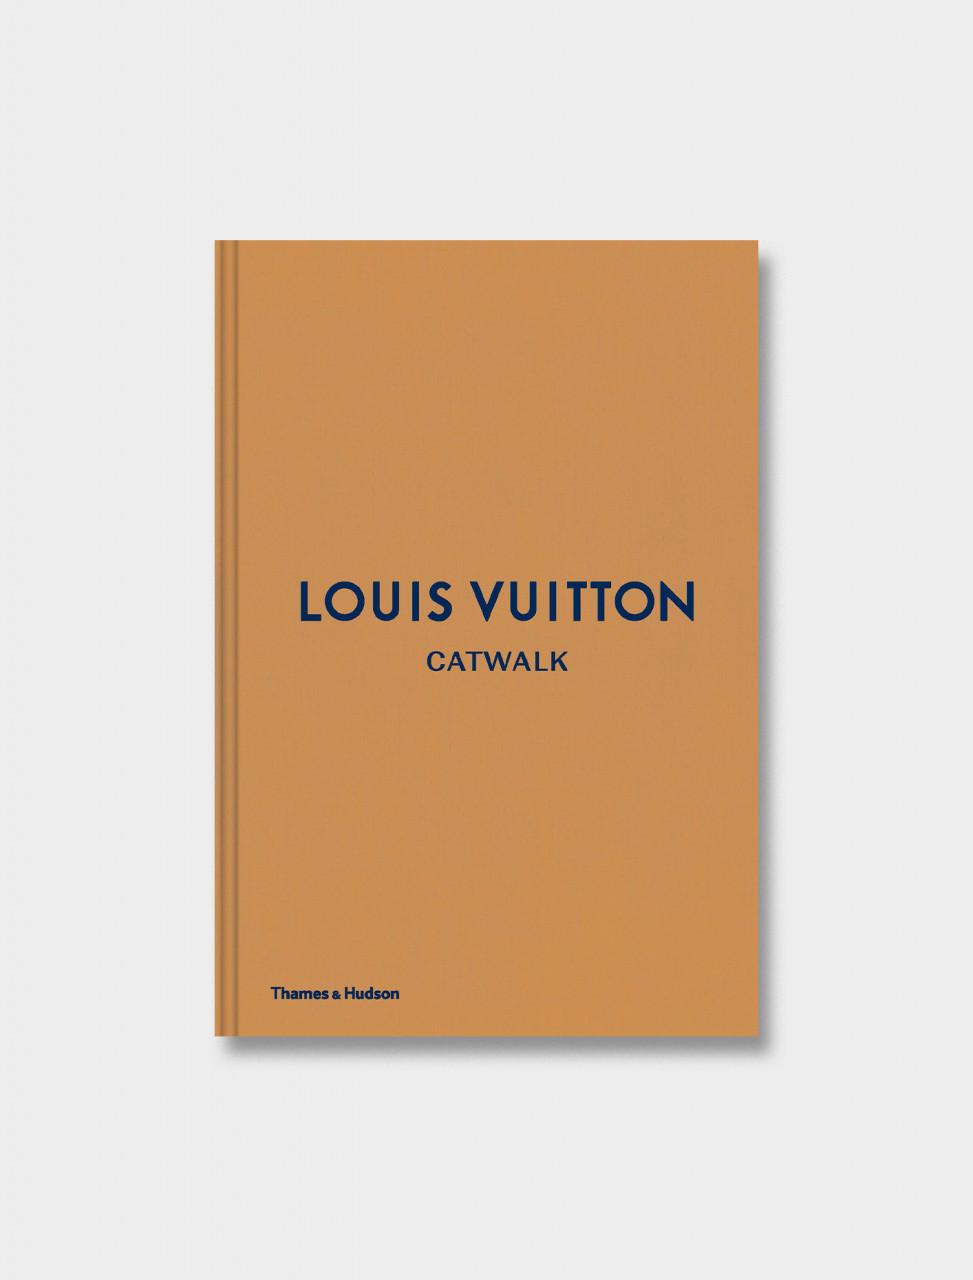 9780500519943 Louis Vuitton CATWALK